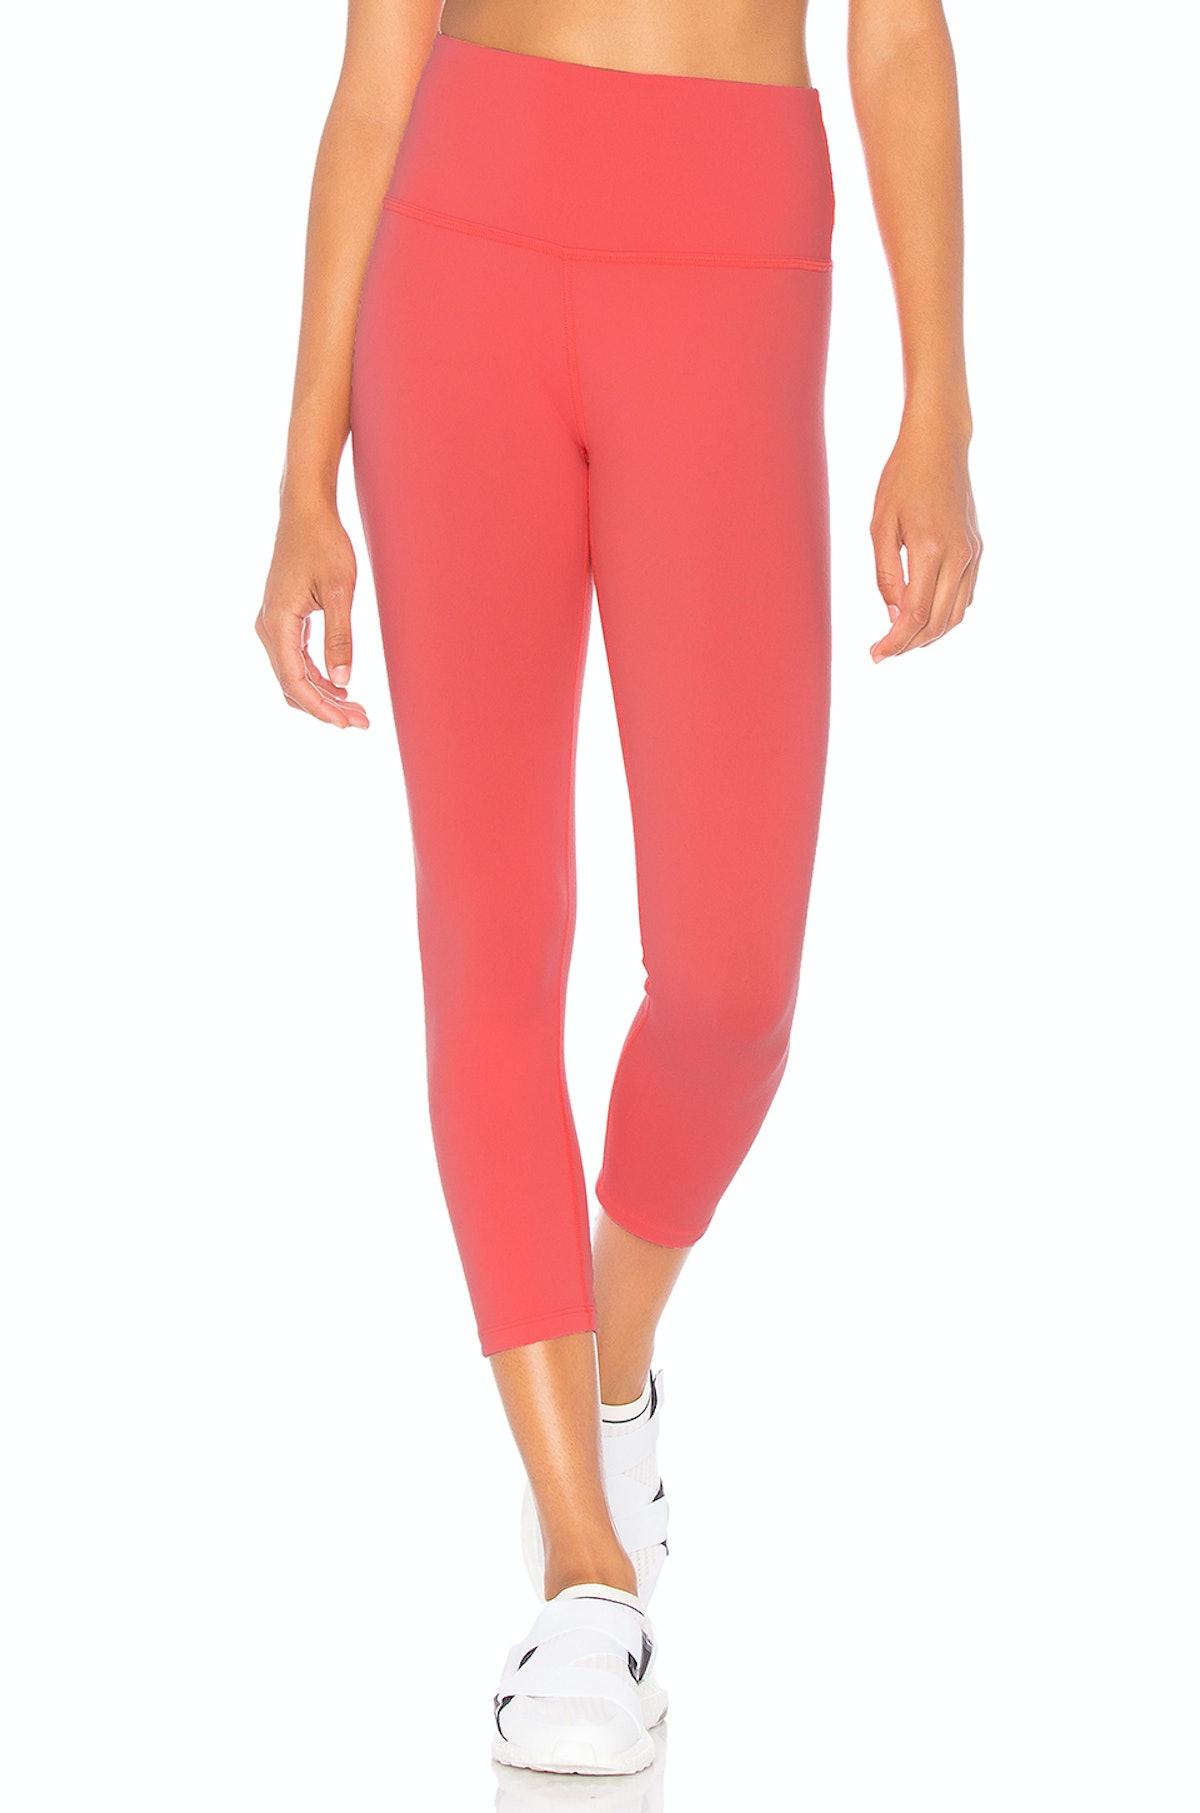 Beyond Yoga High Waisted Capri Legging